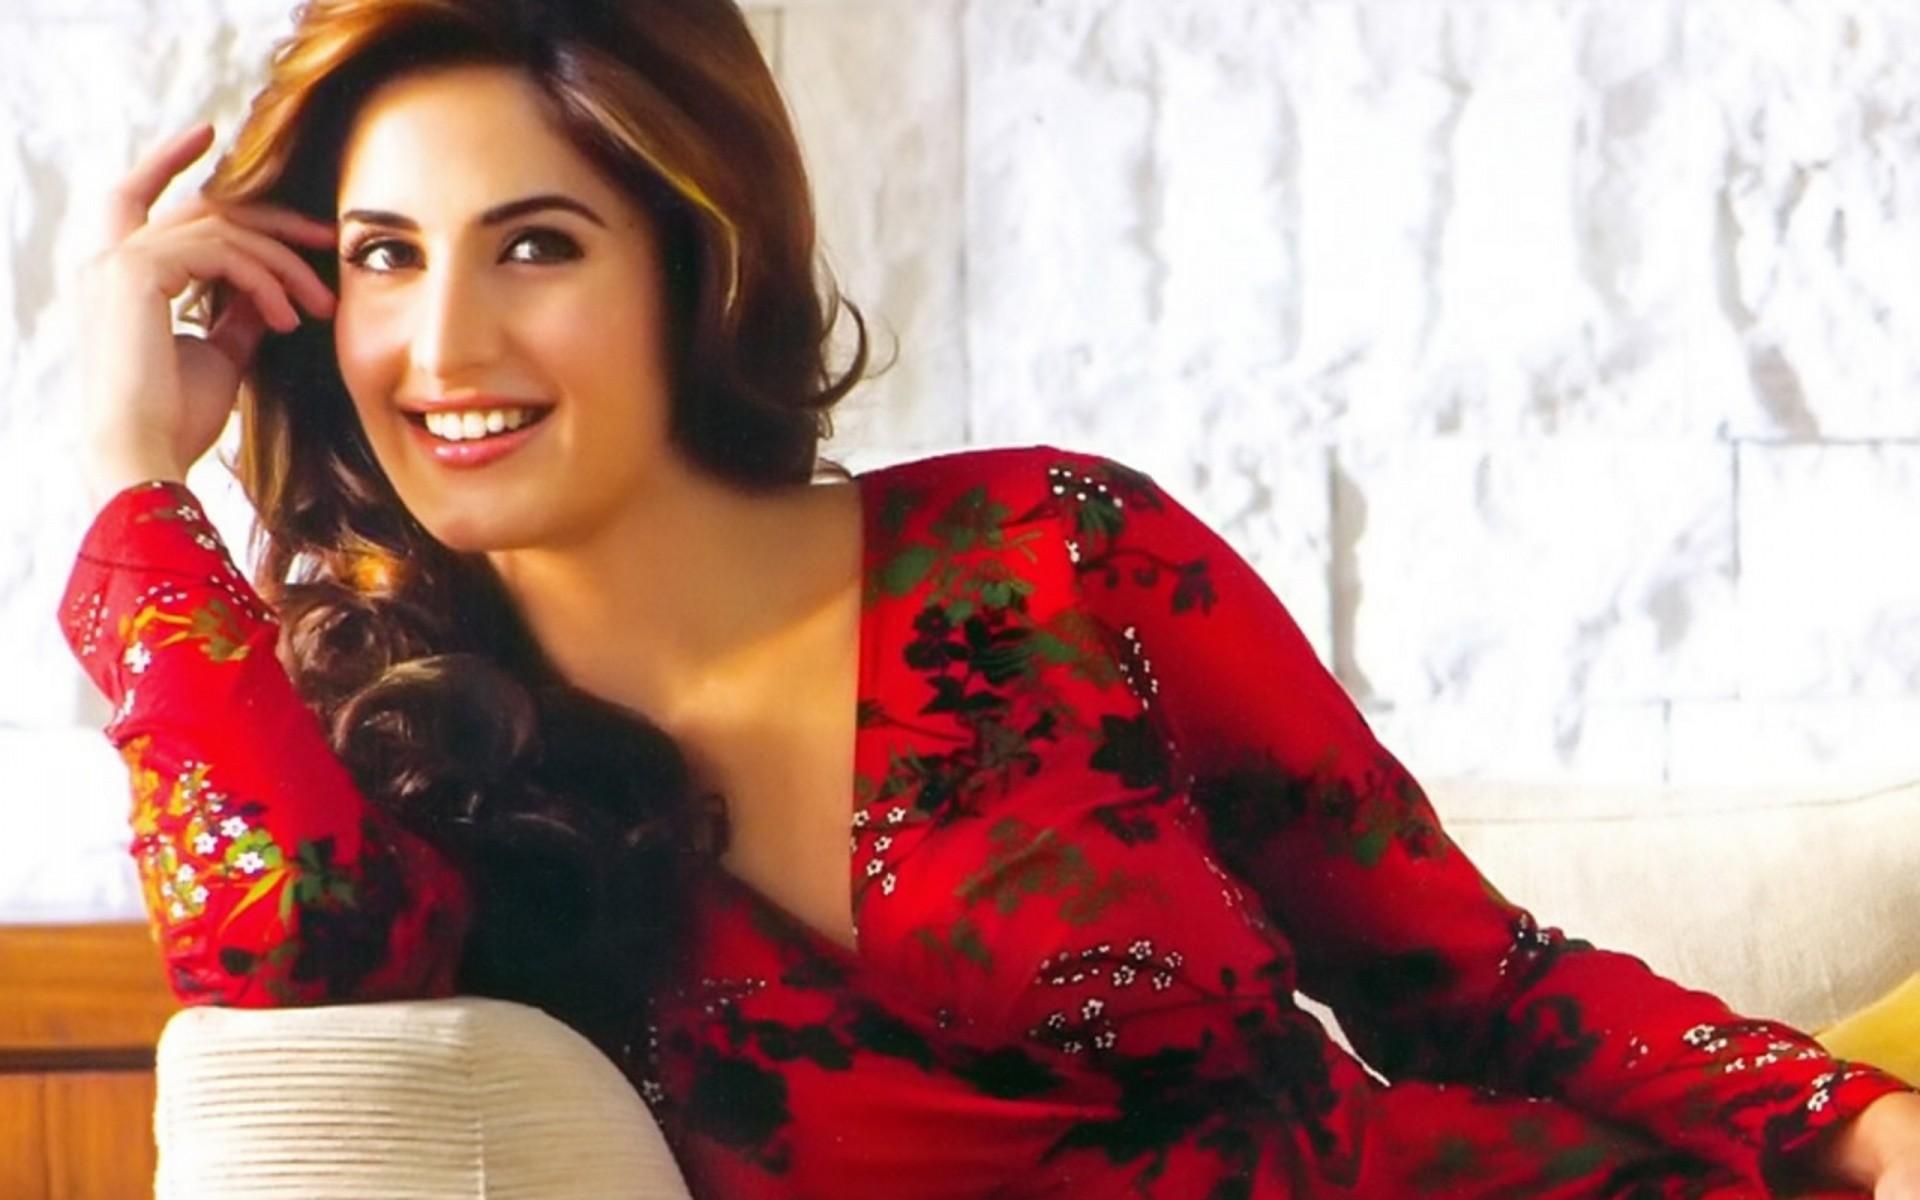 https://images.forwallpaper.com/files/images/d/da44/da44dd2b/761436/bollywood- wallpaper-actresses-kapoor-sonam-photos-wallpapers-actress-articles-dp…